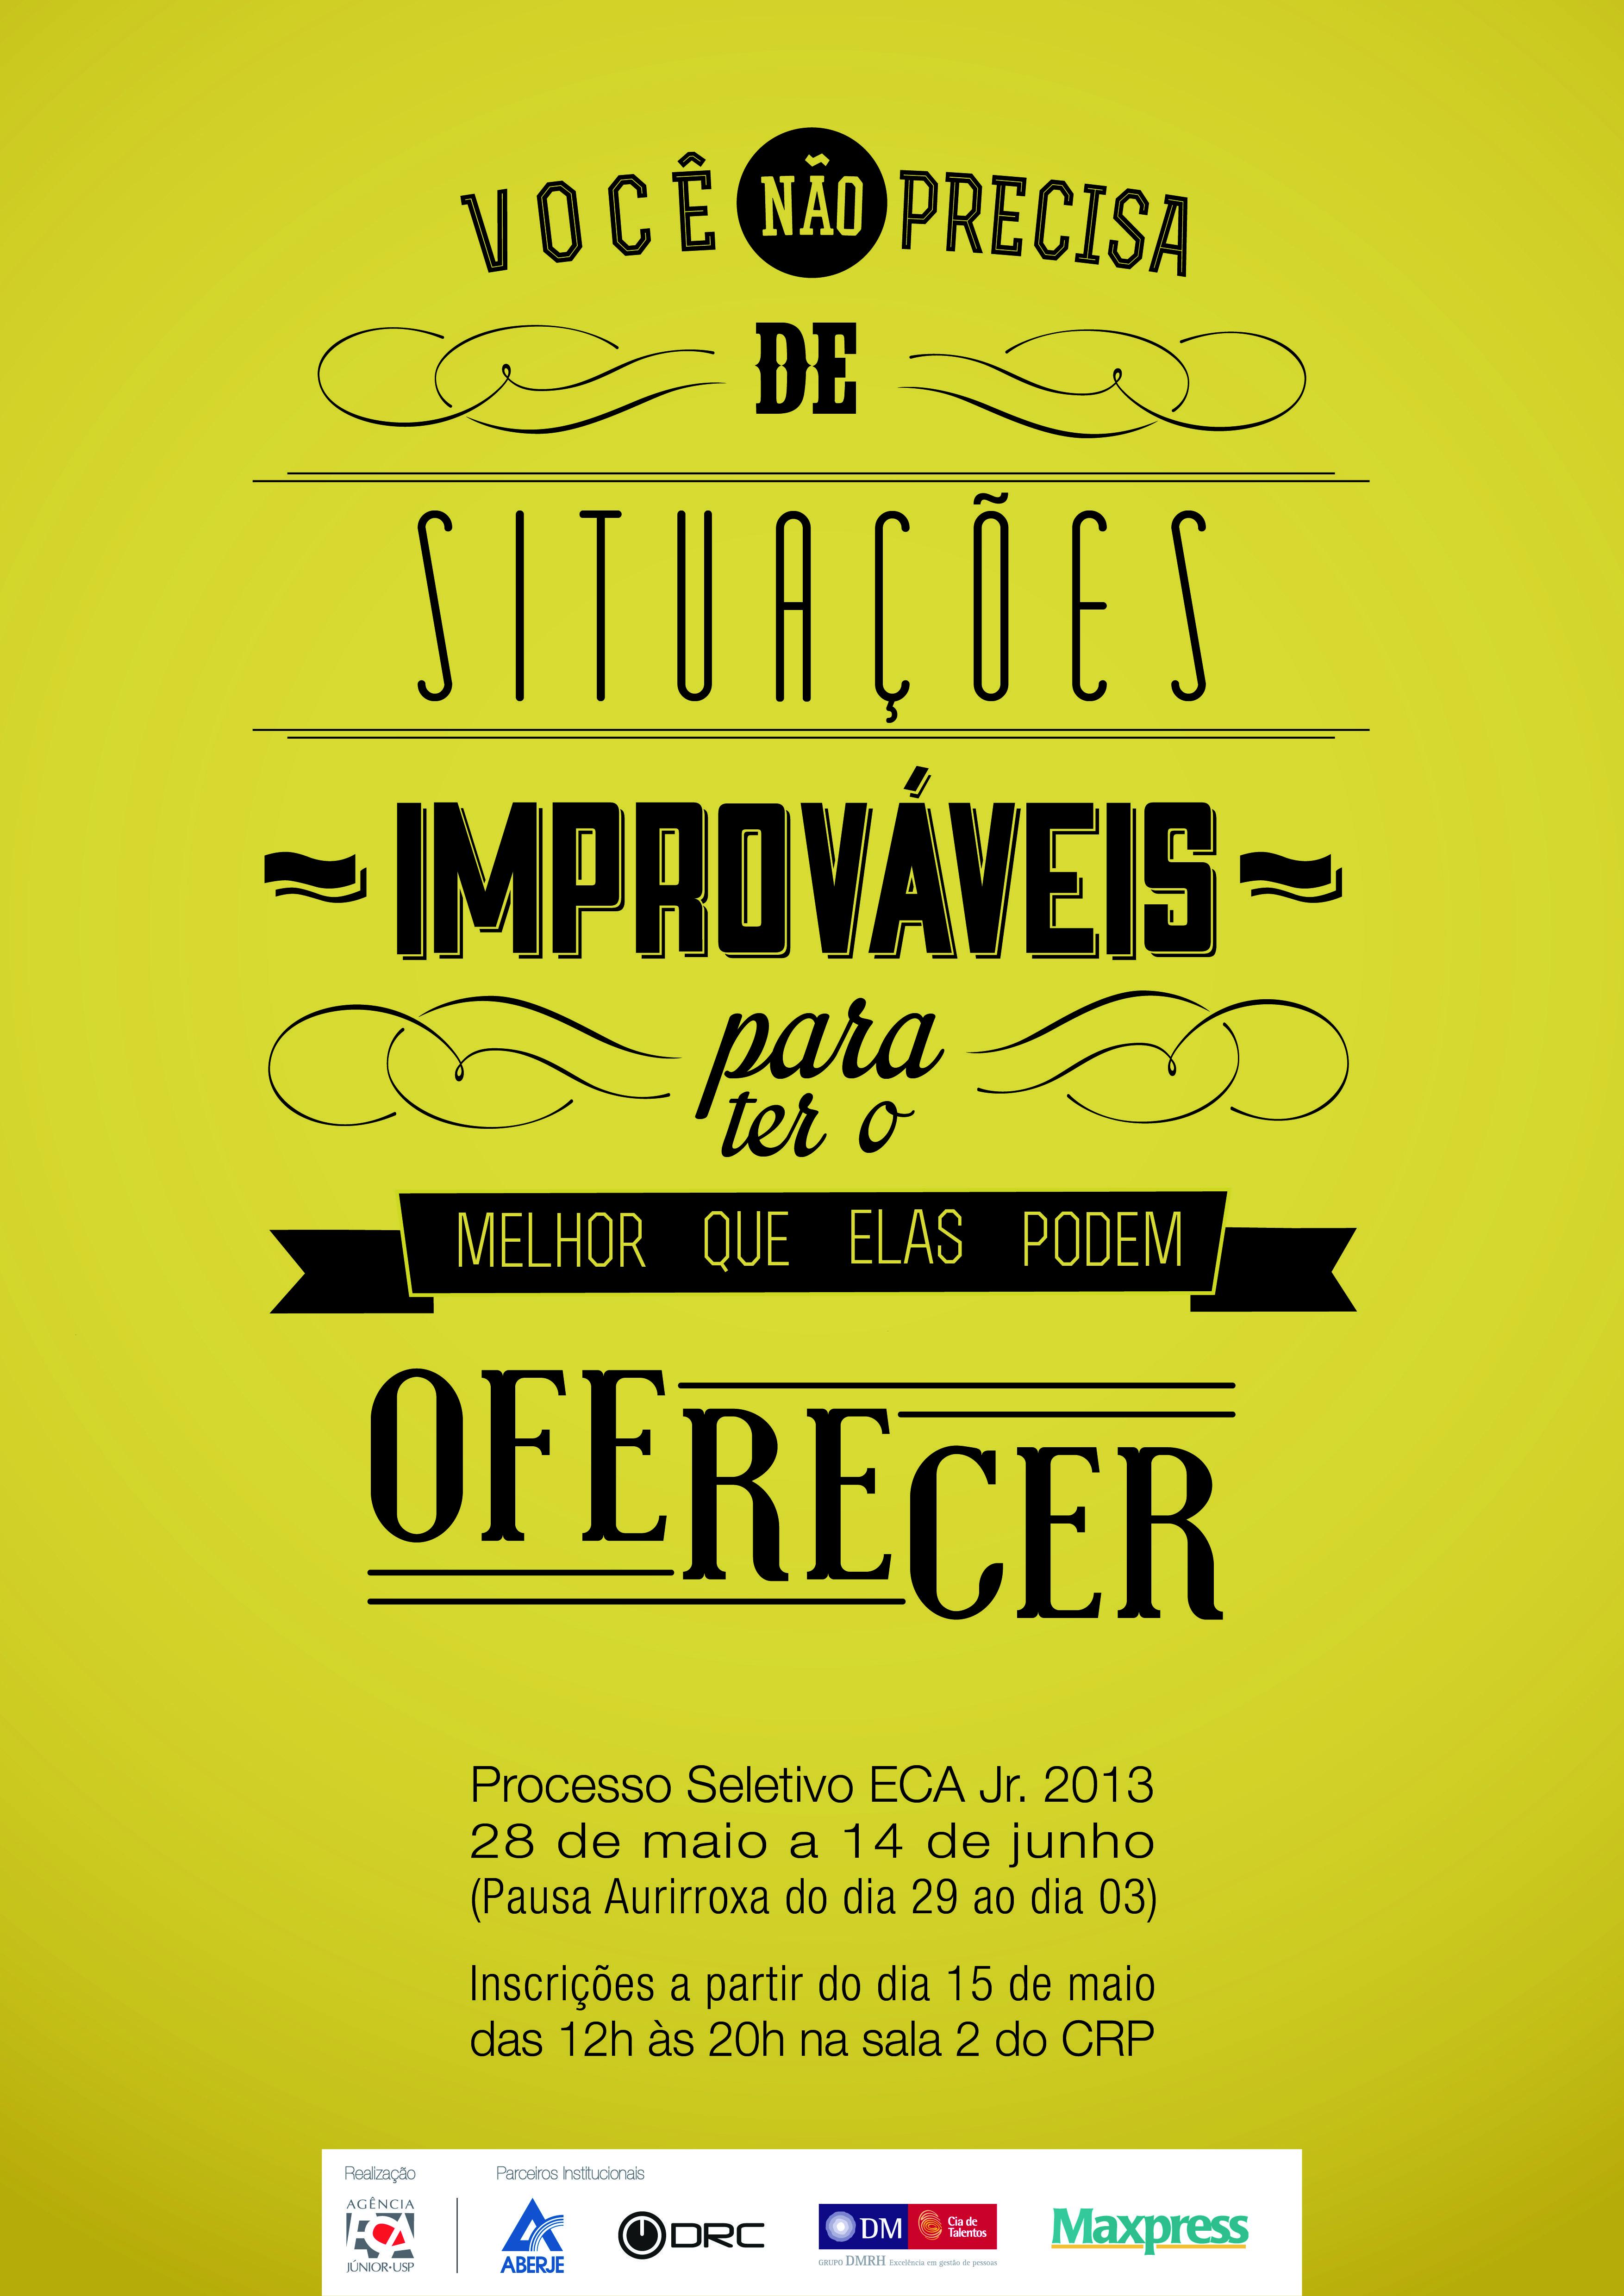 Processo Seletivo ECA Jr. - André Dorea   Design/Layout   Pinterest ...